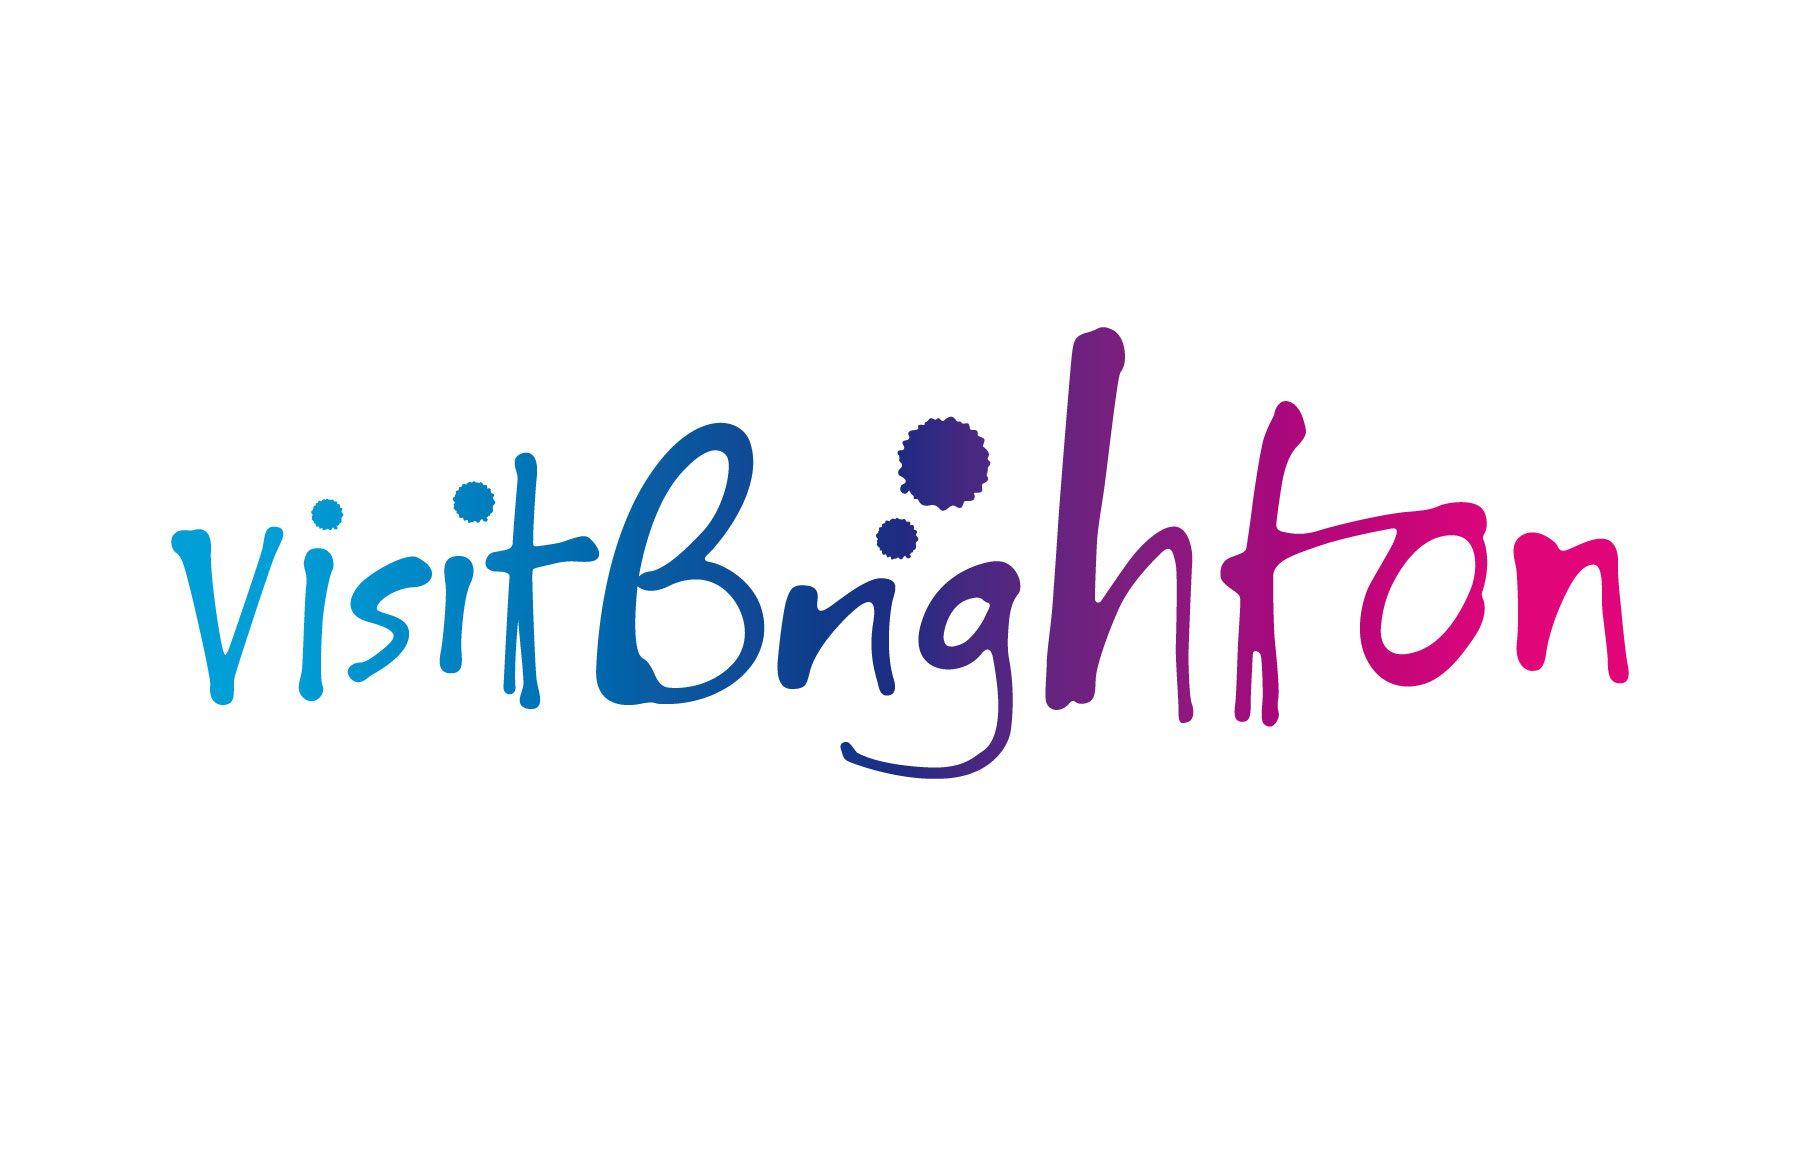 """Visit Brighton"" logo"